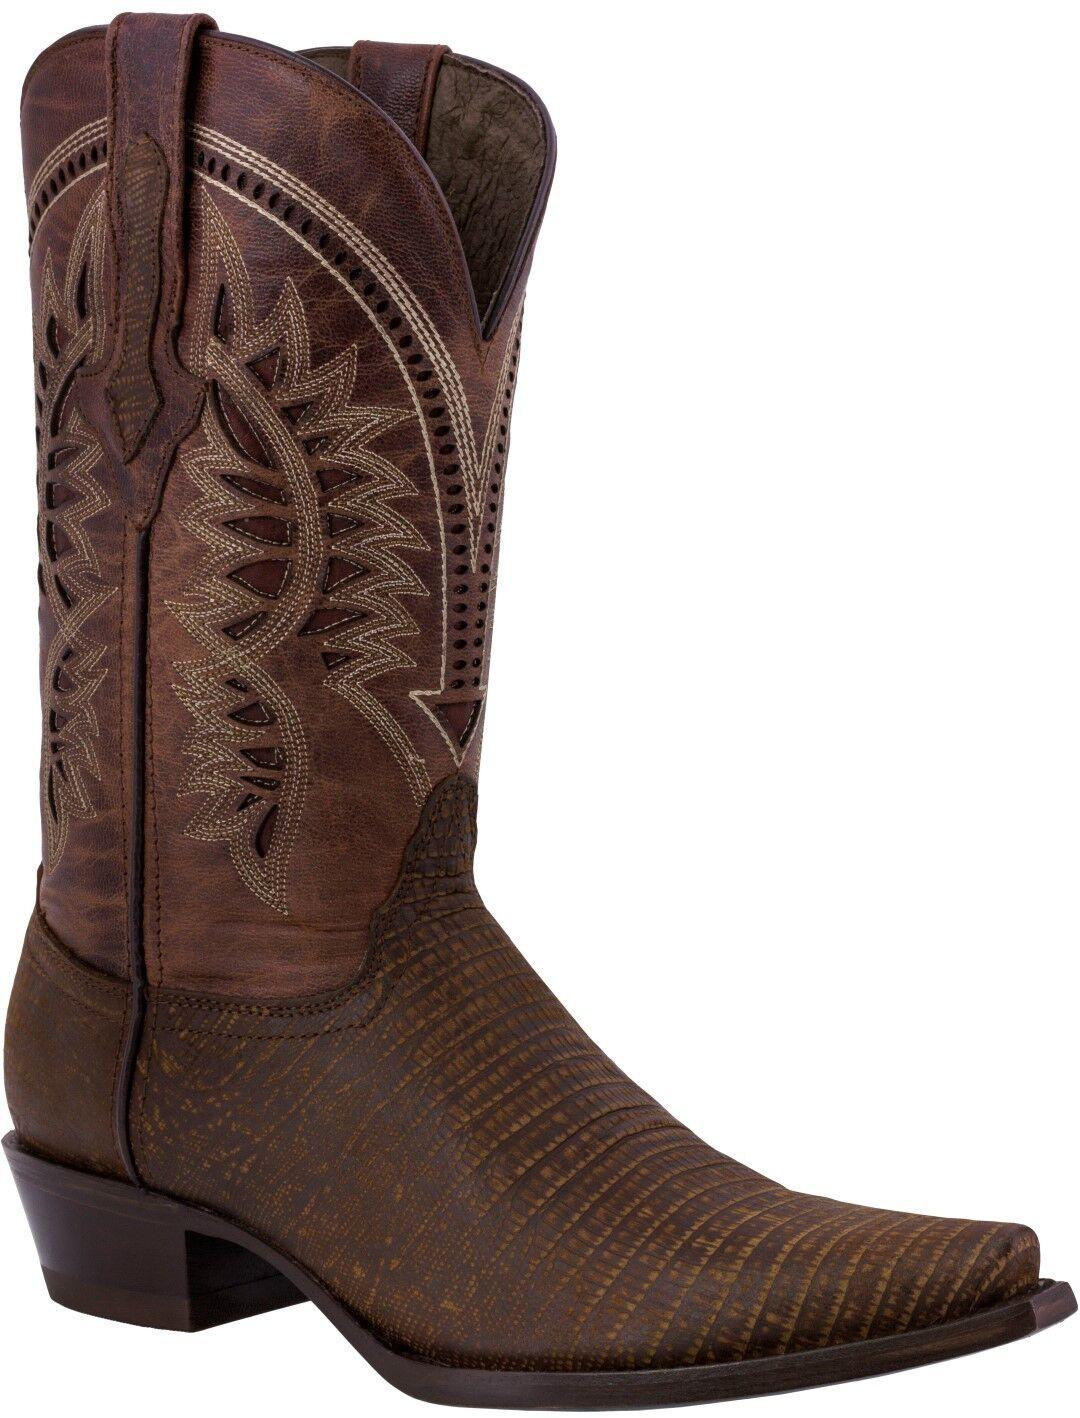 Uomo Cognac Lizard Print Pelle Pelle Pelle Cowboy Stivali Casual Dress Pointed Toe ea2193